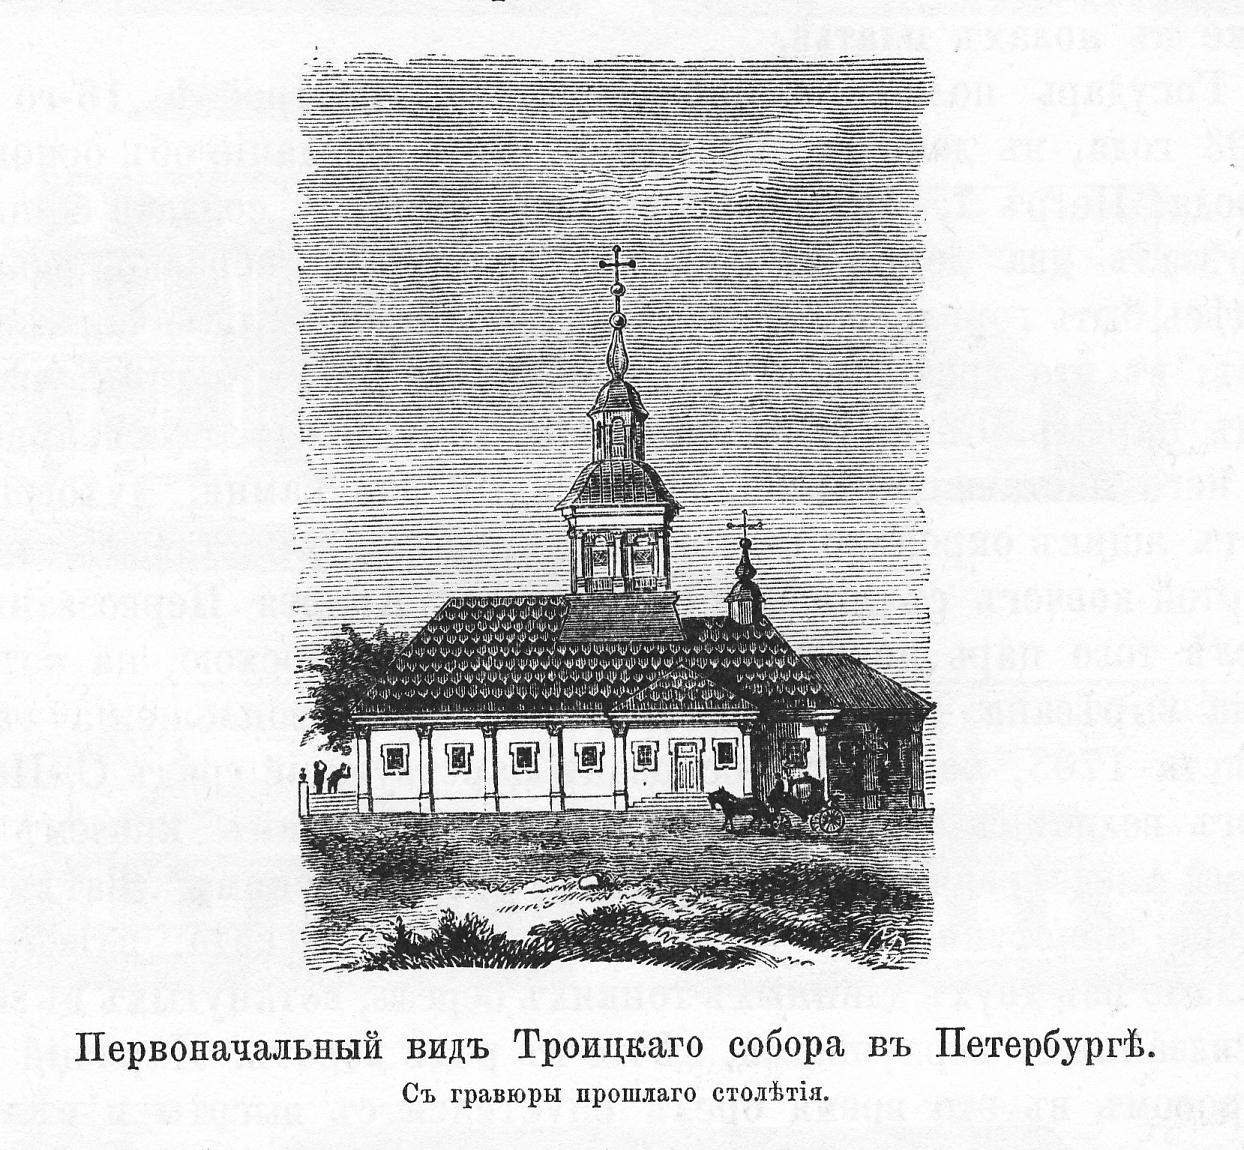 Троицкий собор Санкт- Петербург